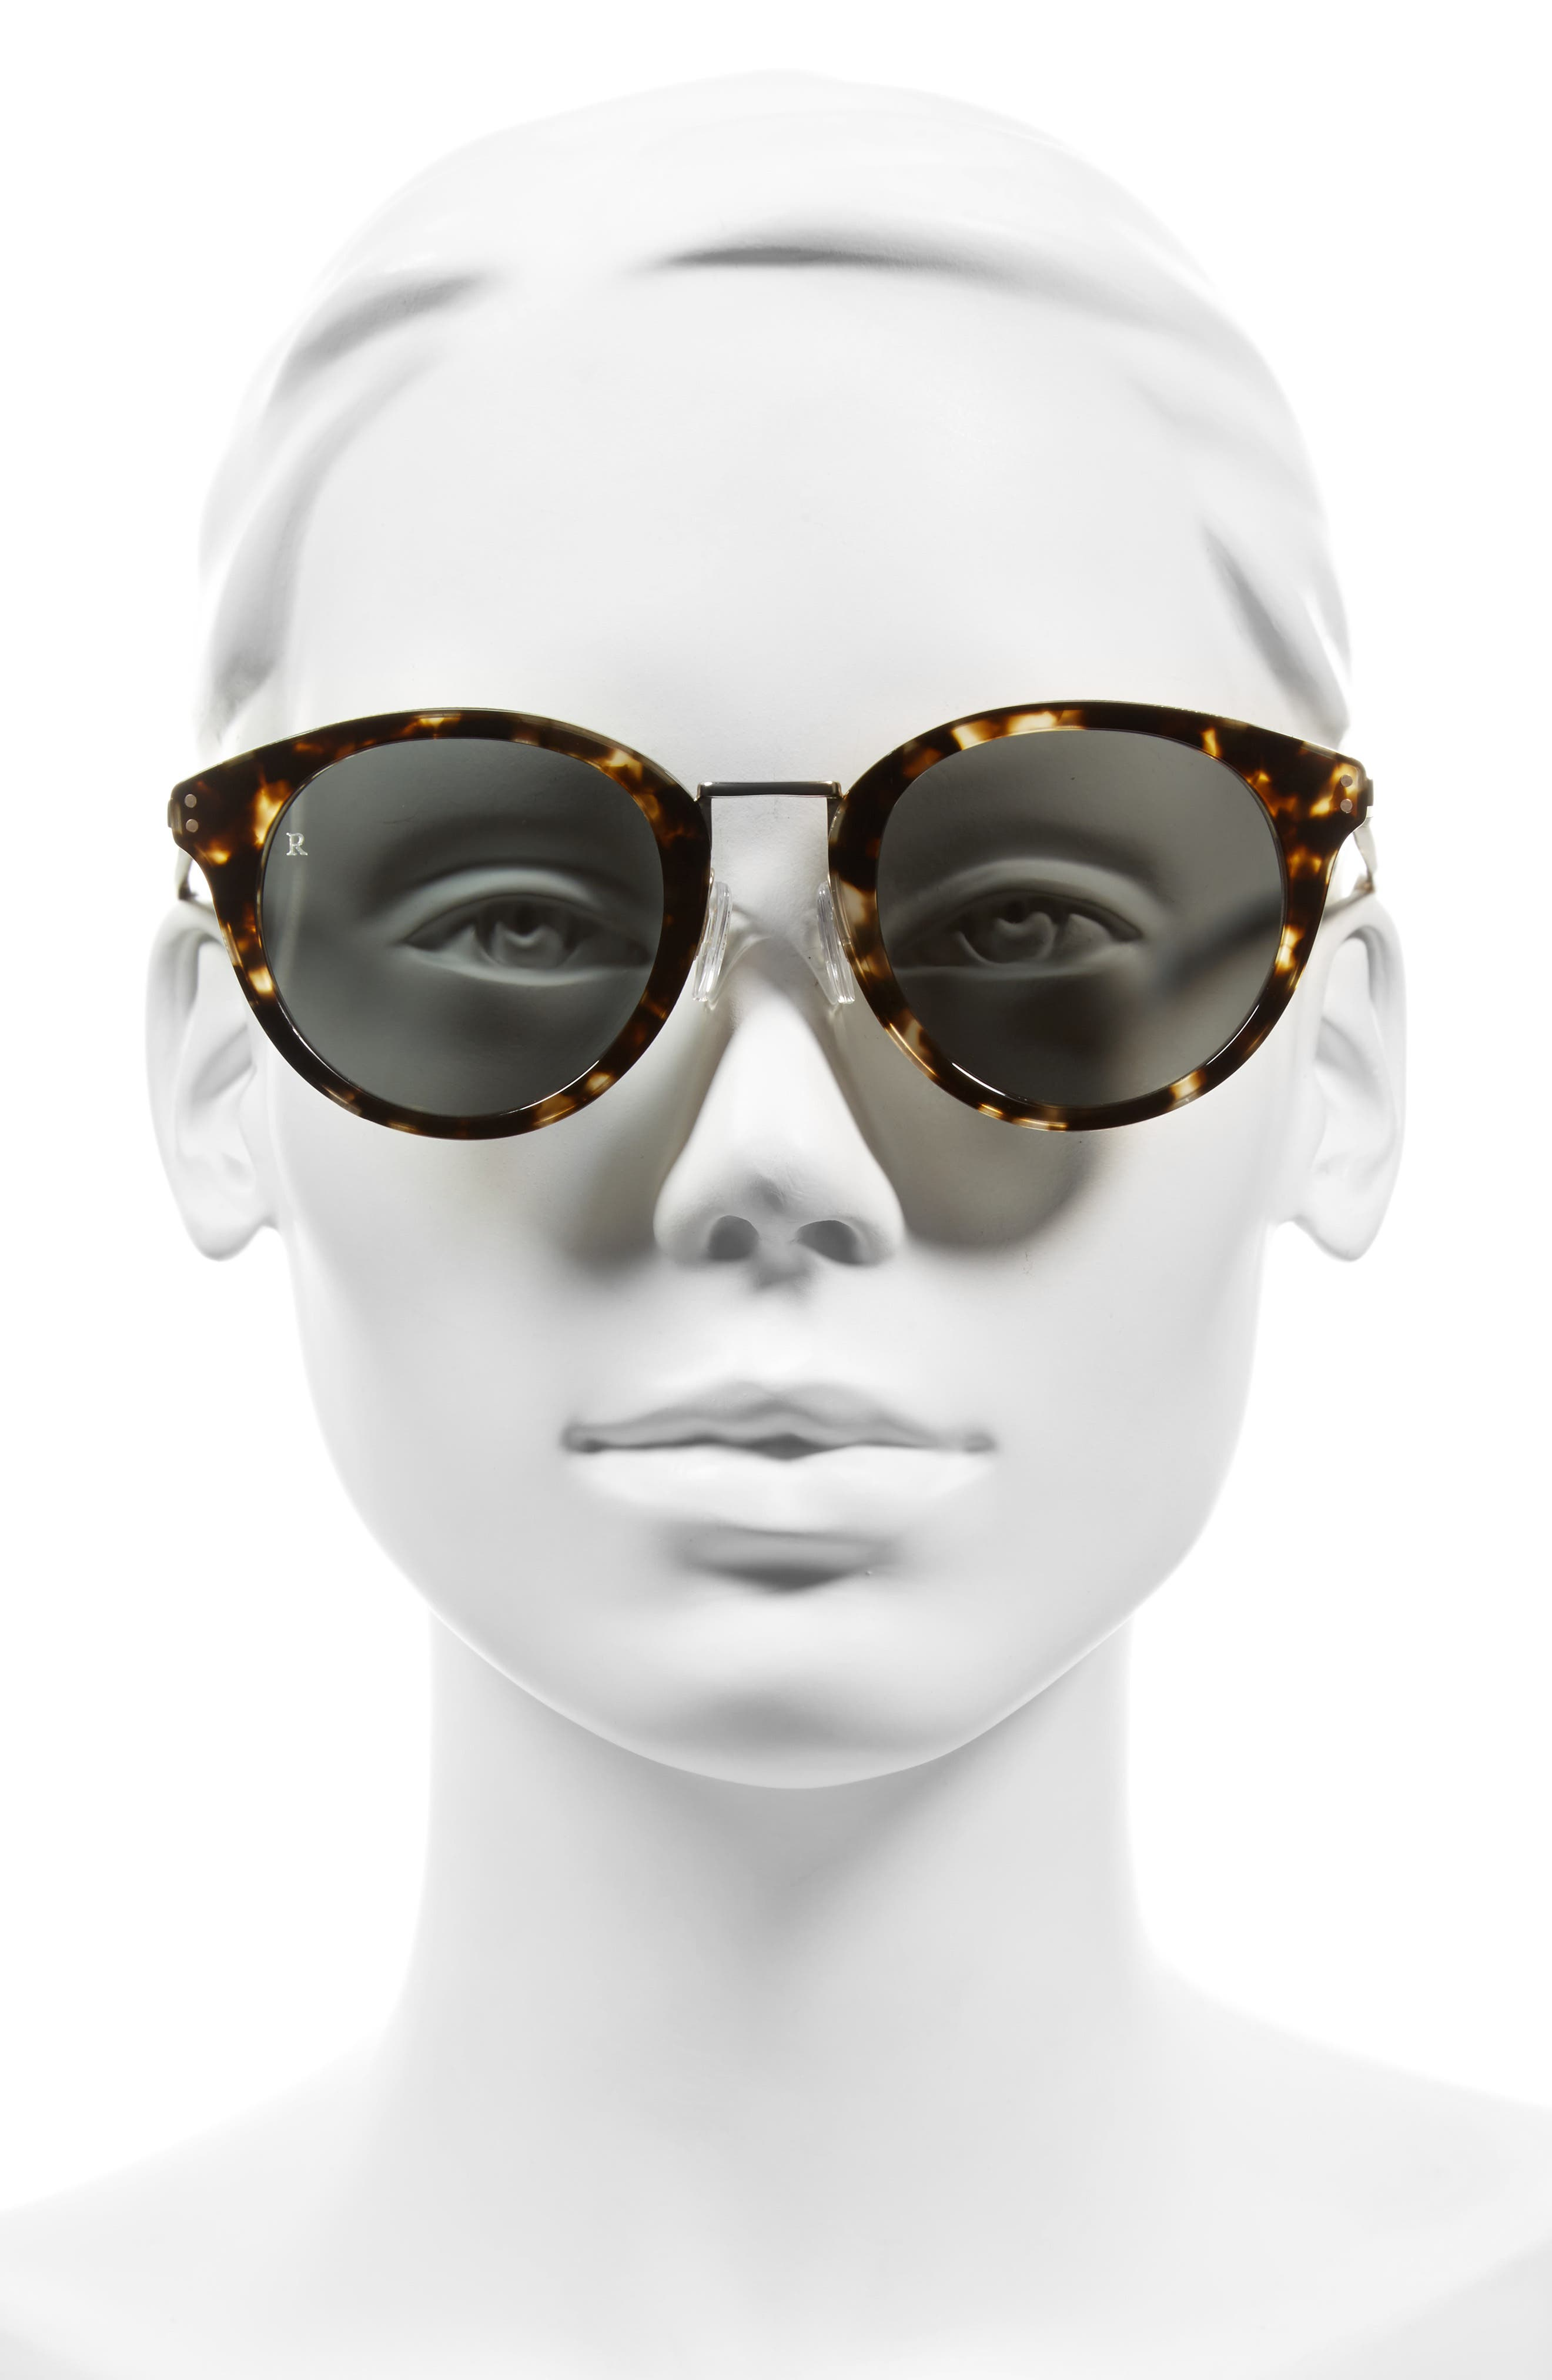 Potrero 50mm Sunglasses,                             Alternate thumbnail 2, color,                             Brindle Tortoise